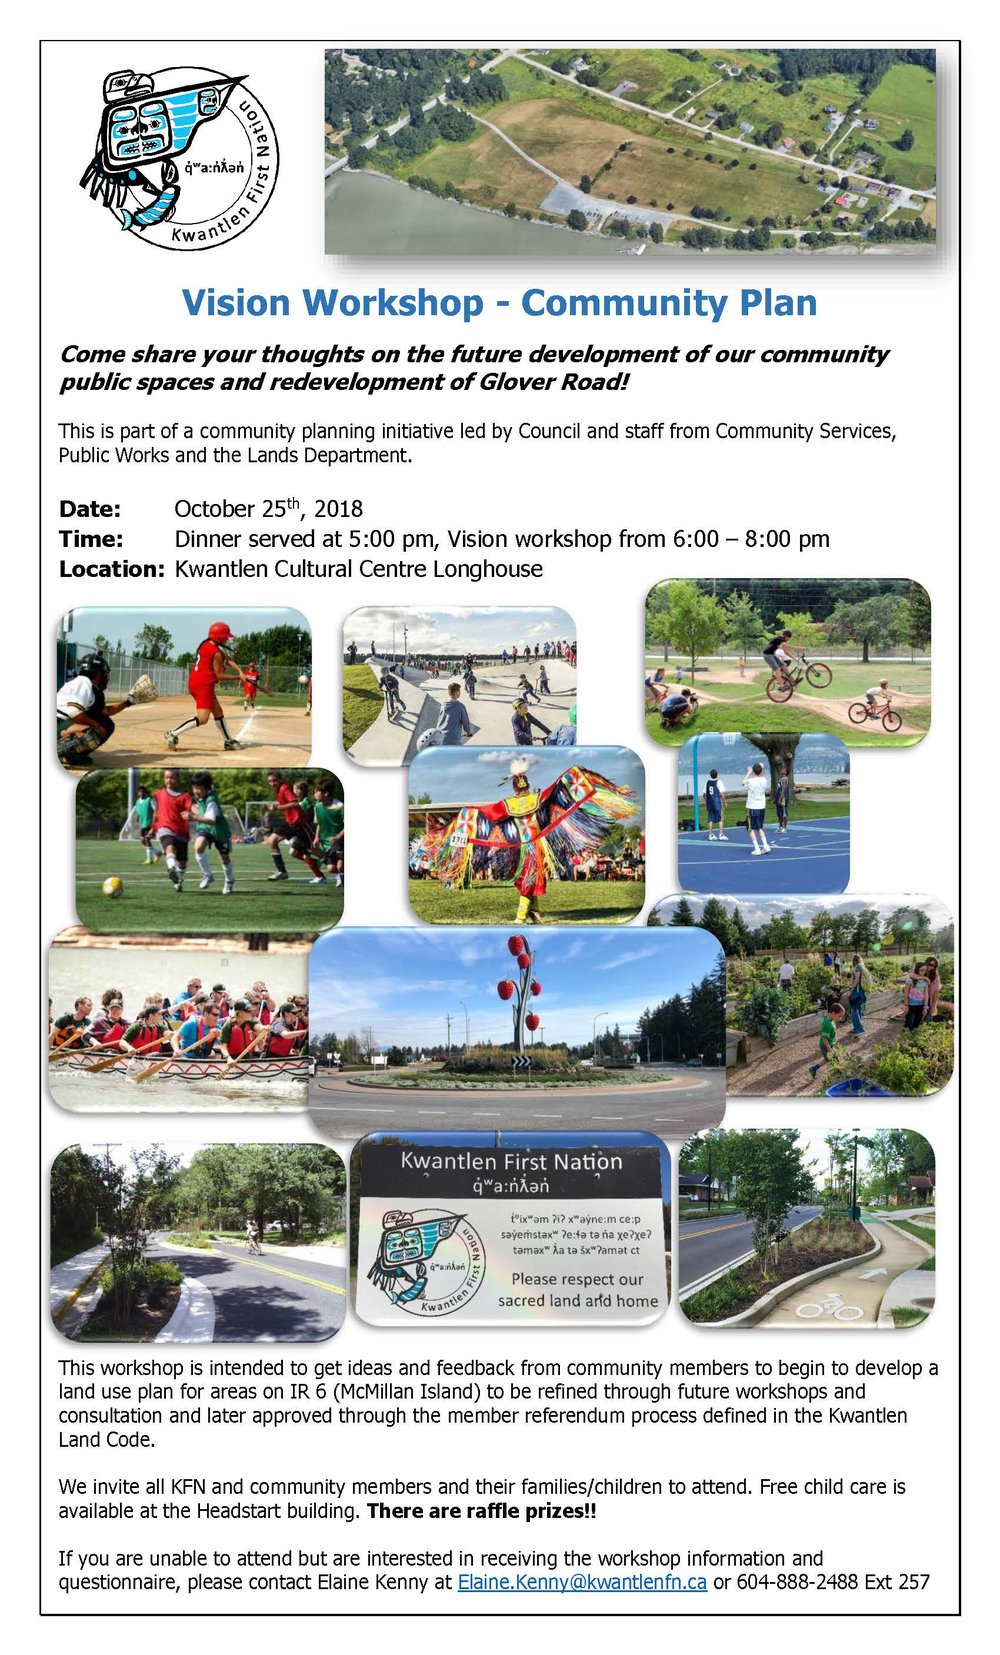 Oct 25 Community Plan Vision Workshop Follow up Flyer.jpg